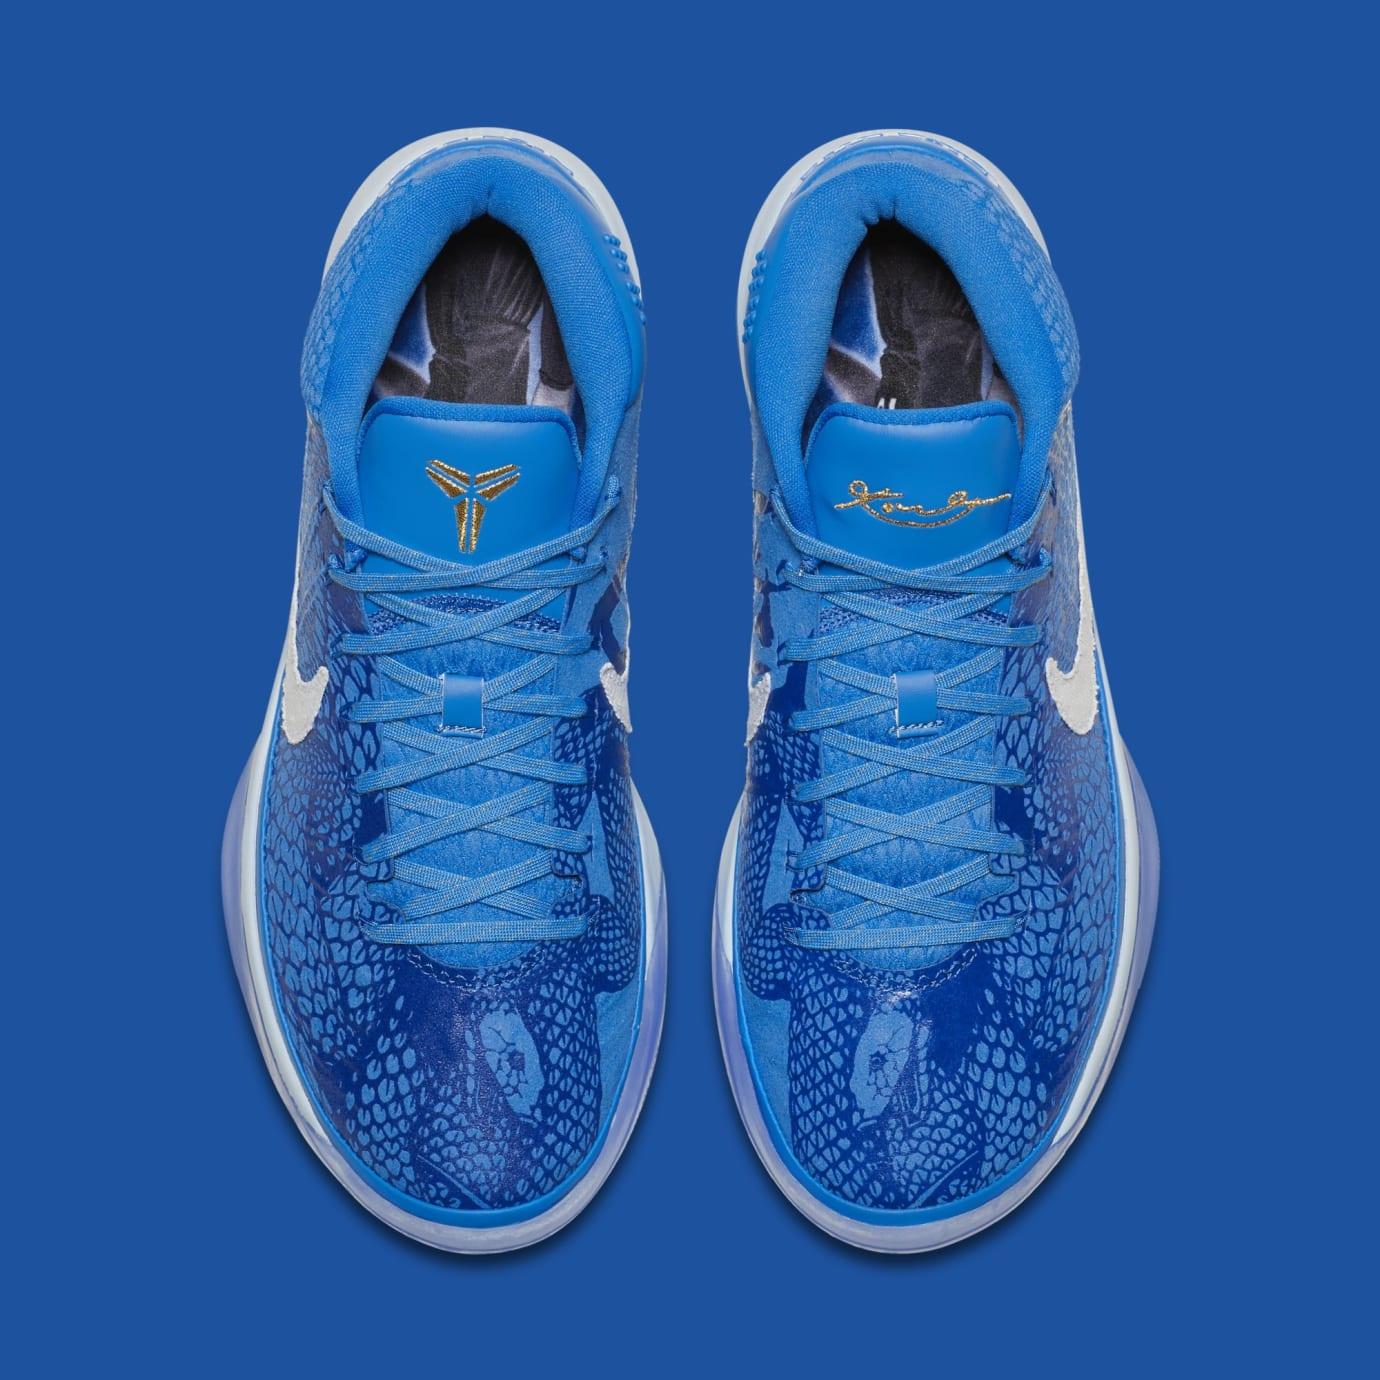 4034b622d Image via Nike Nike Kobe A.D. Mid DeMar DeRozan PE AQ2722-900 (Top)